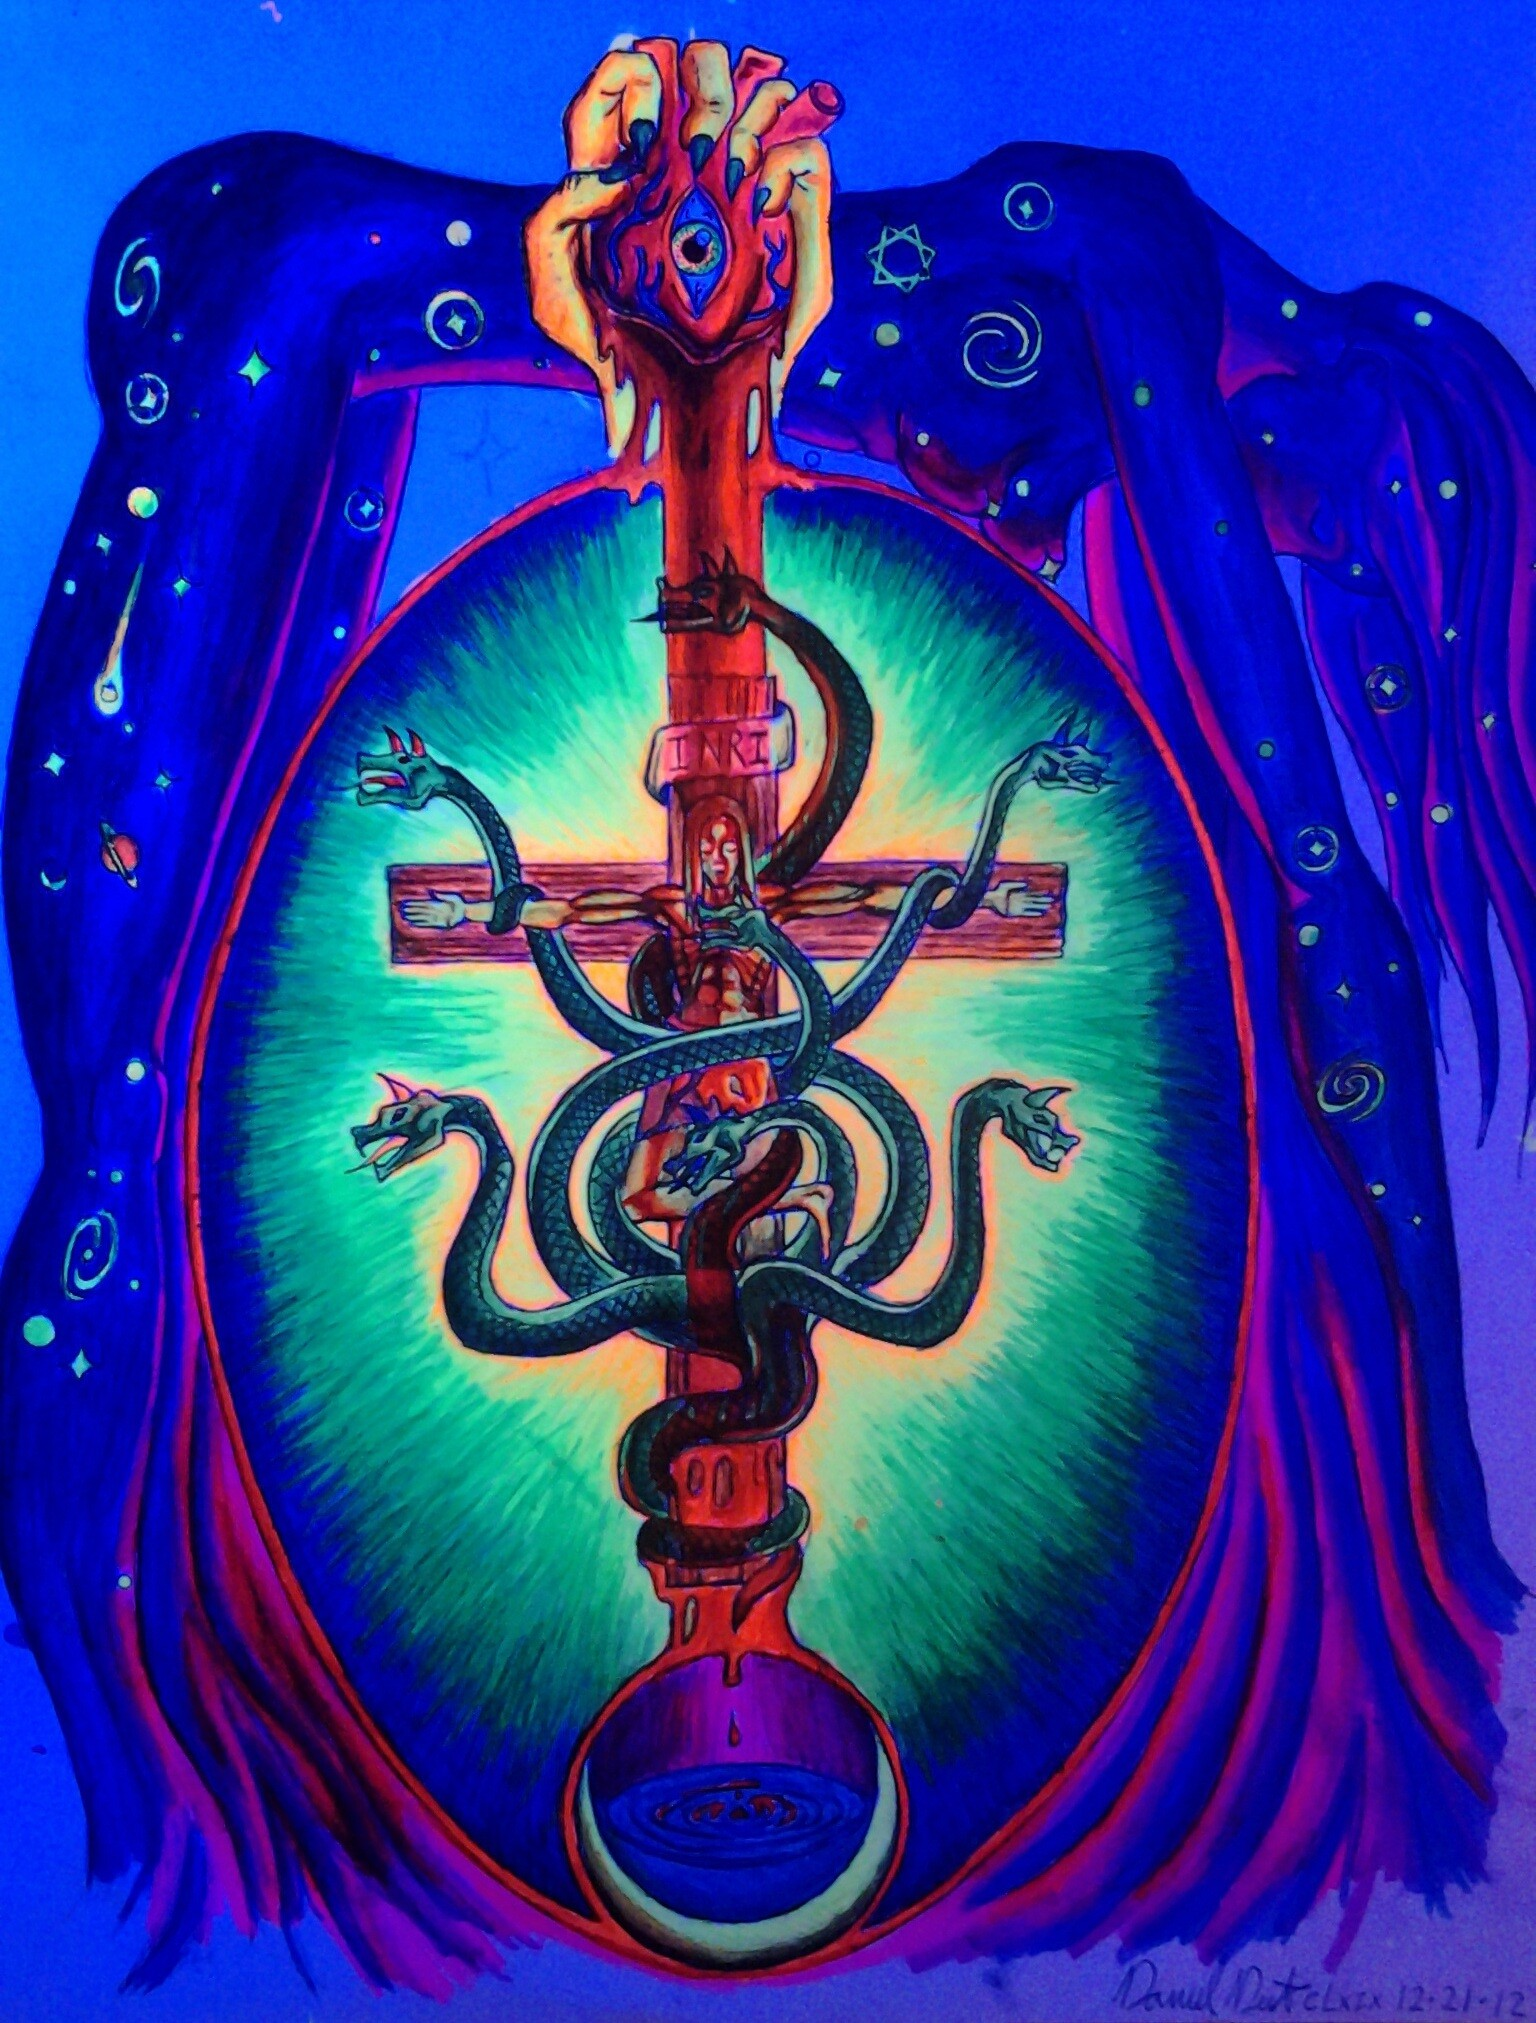 Daniel denta i qlb o dm inri m q the living image of the mark of the beast 666